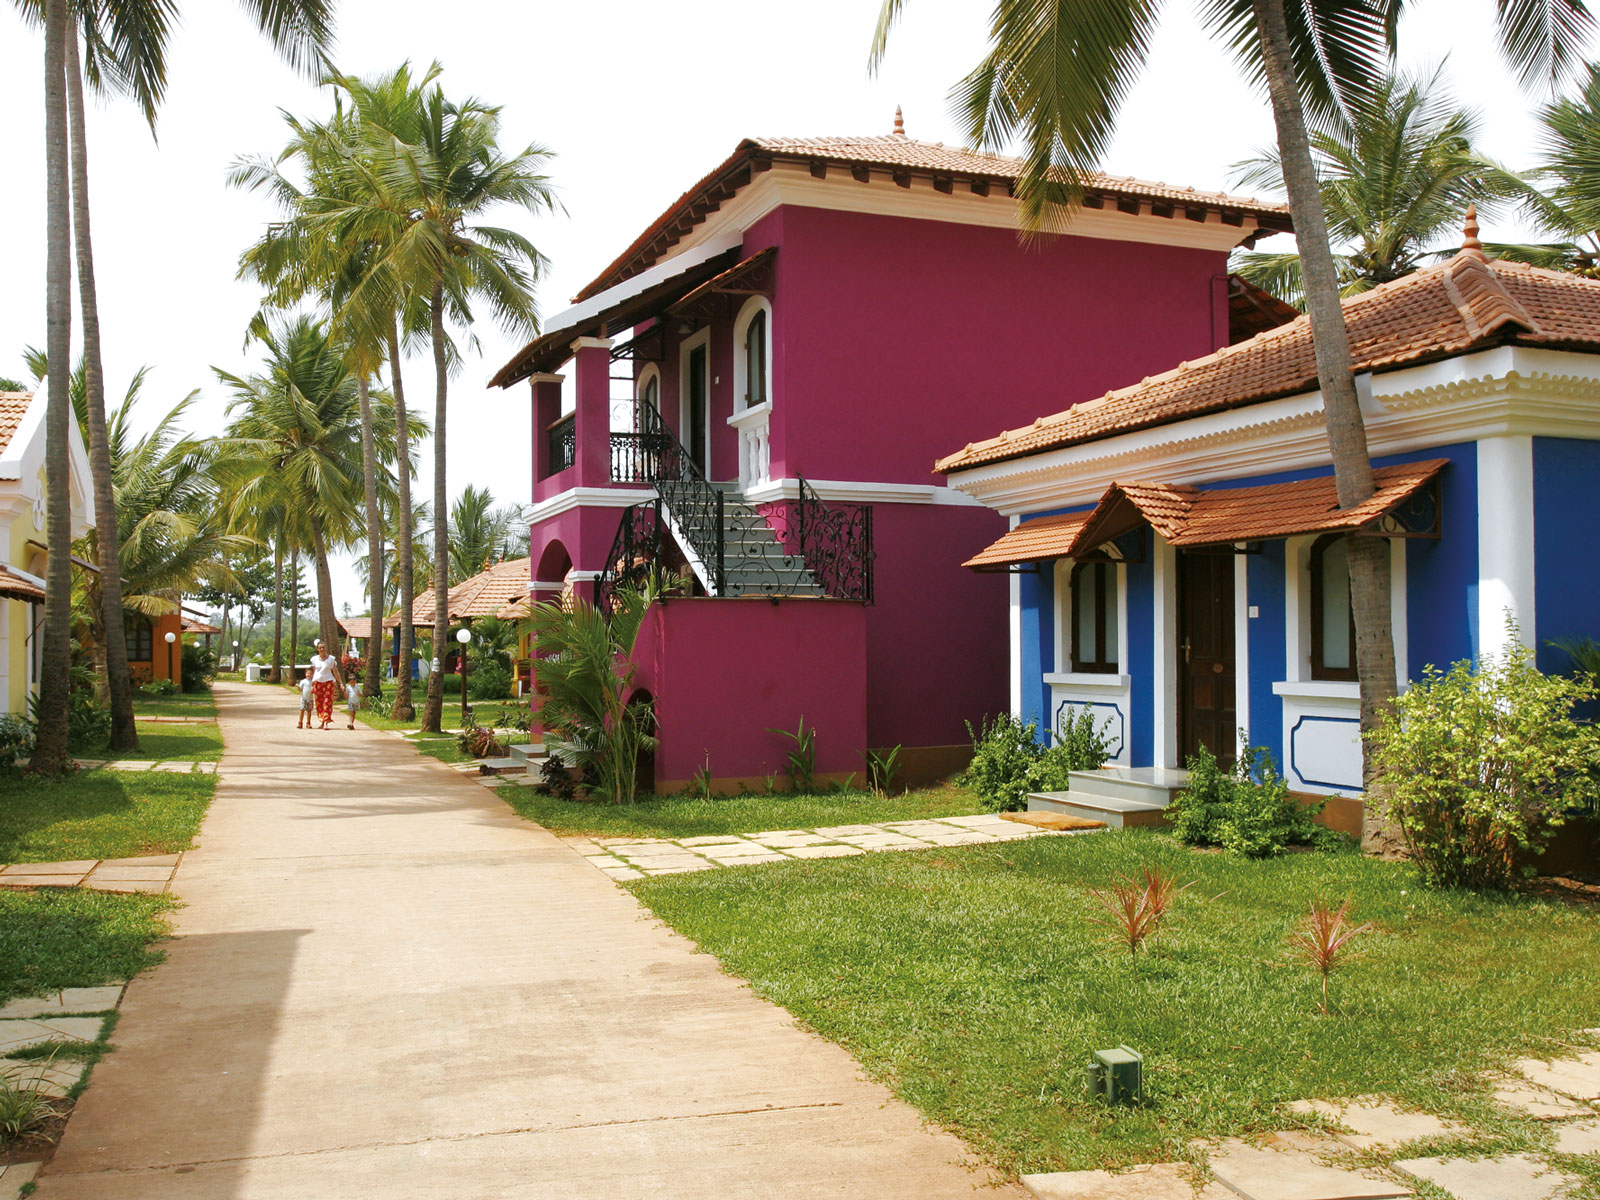 indien-goa-devaaya-ayurveda-cottages.jpg